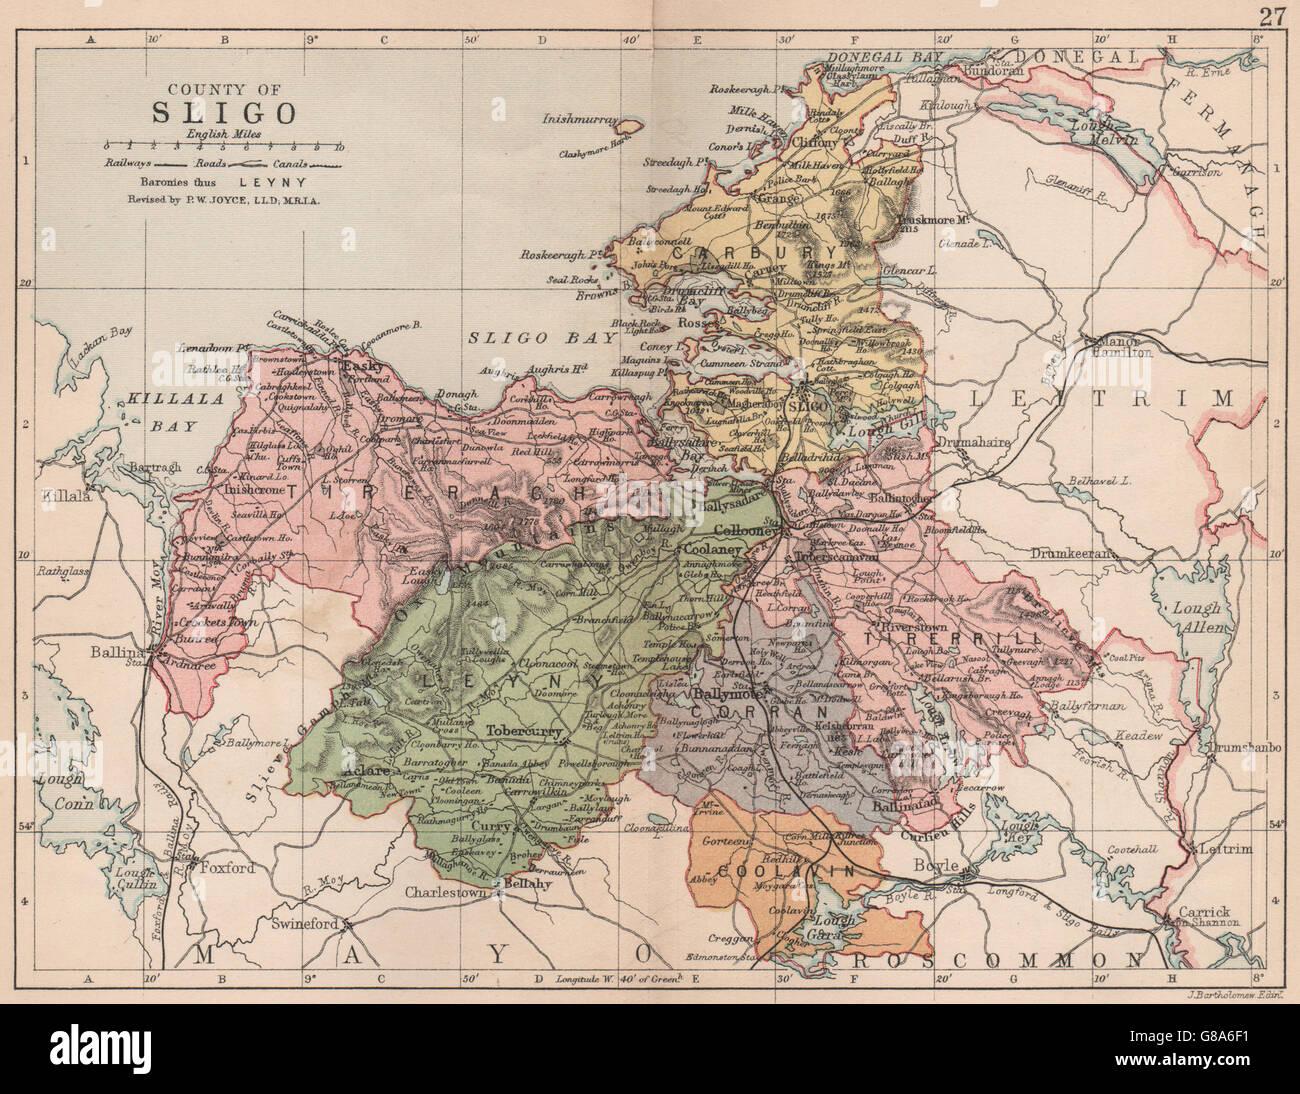 Antique county map COUNTY LEITRIM Connaught BARTHOLOMEW 1882 Ireland